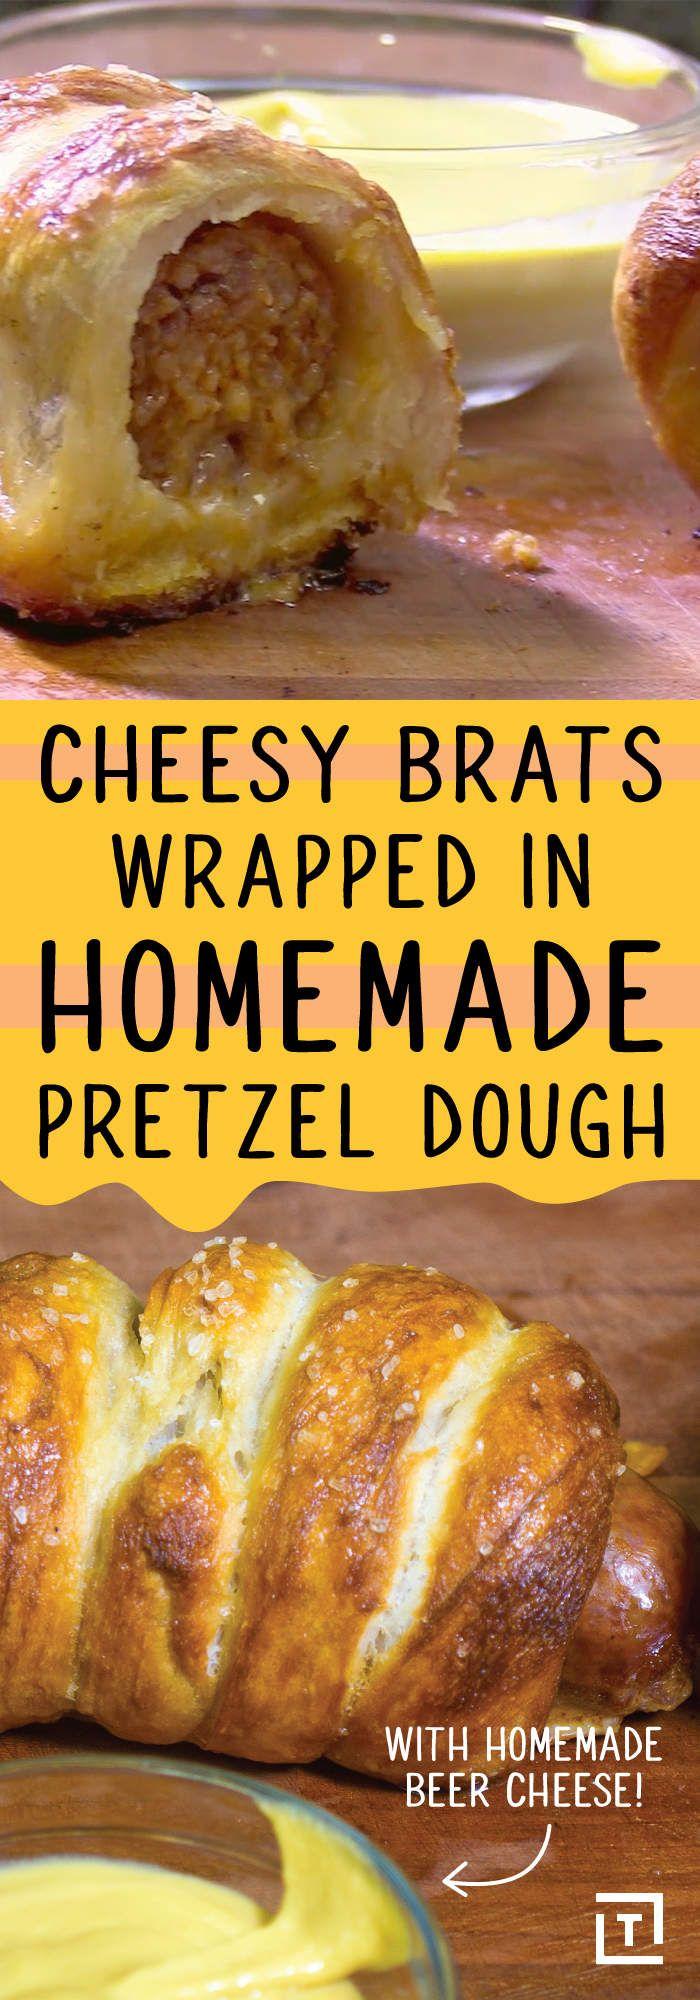 Bratwurst Sausages with a Pretzel Dough Recipe Video - Thrillist